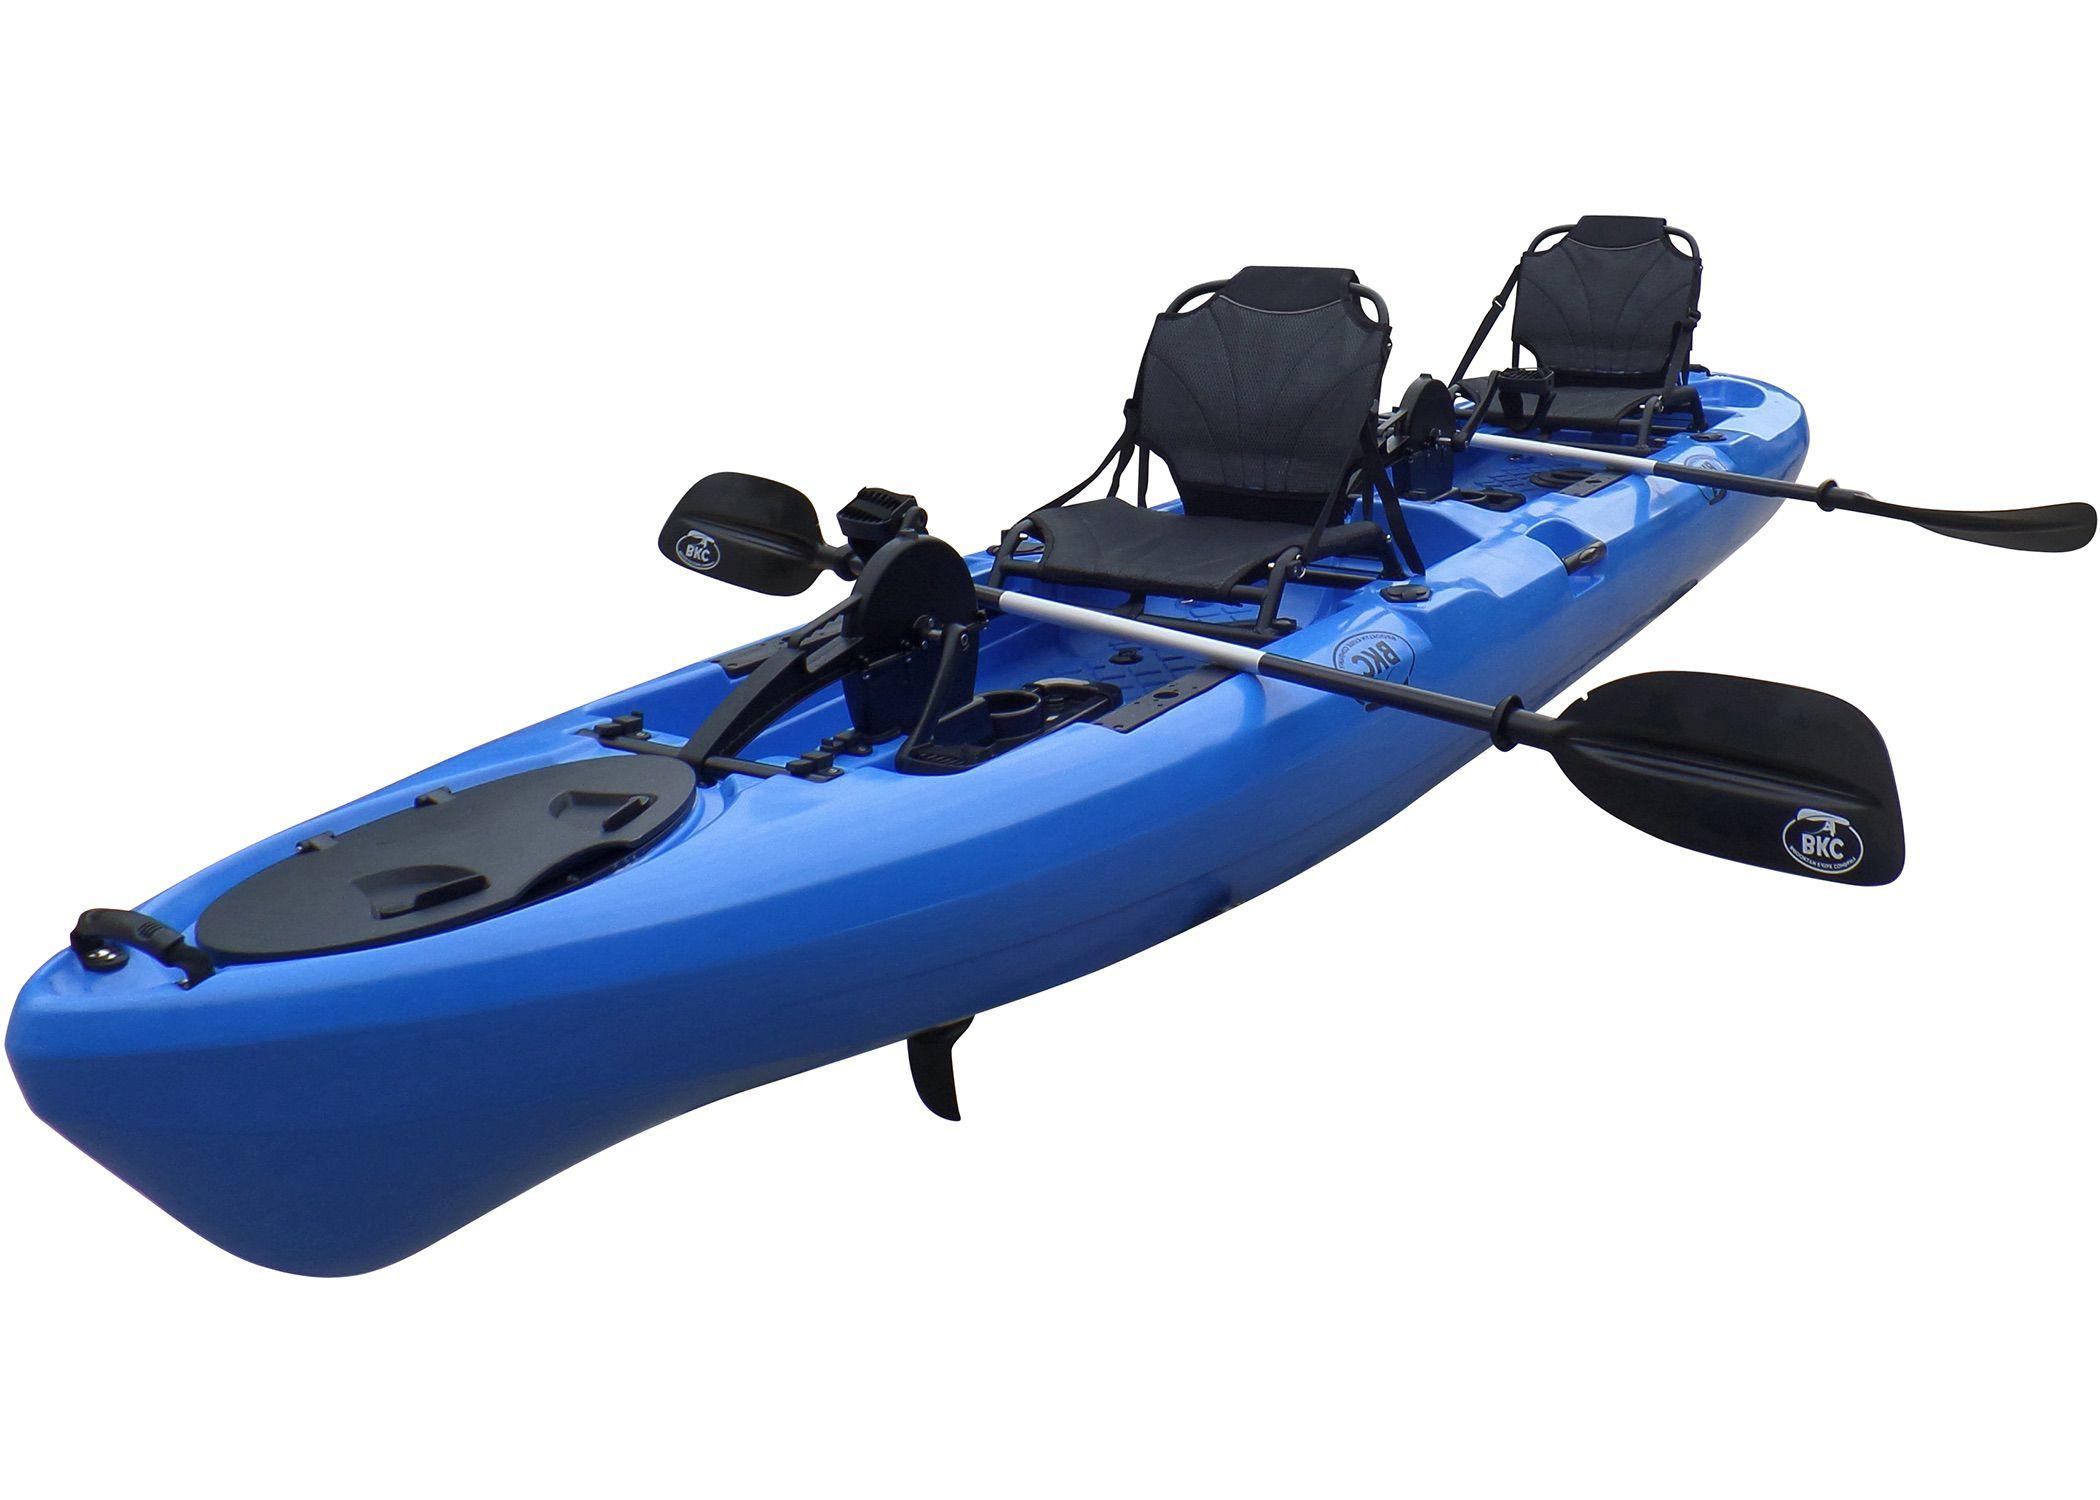 BKC PK14 Angler 14-foot Sit On Top Tandem Fishing Kayak